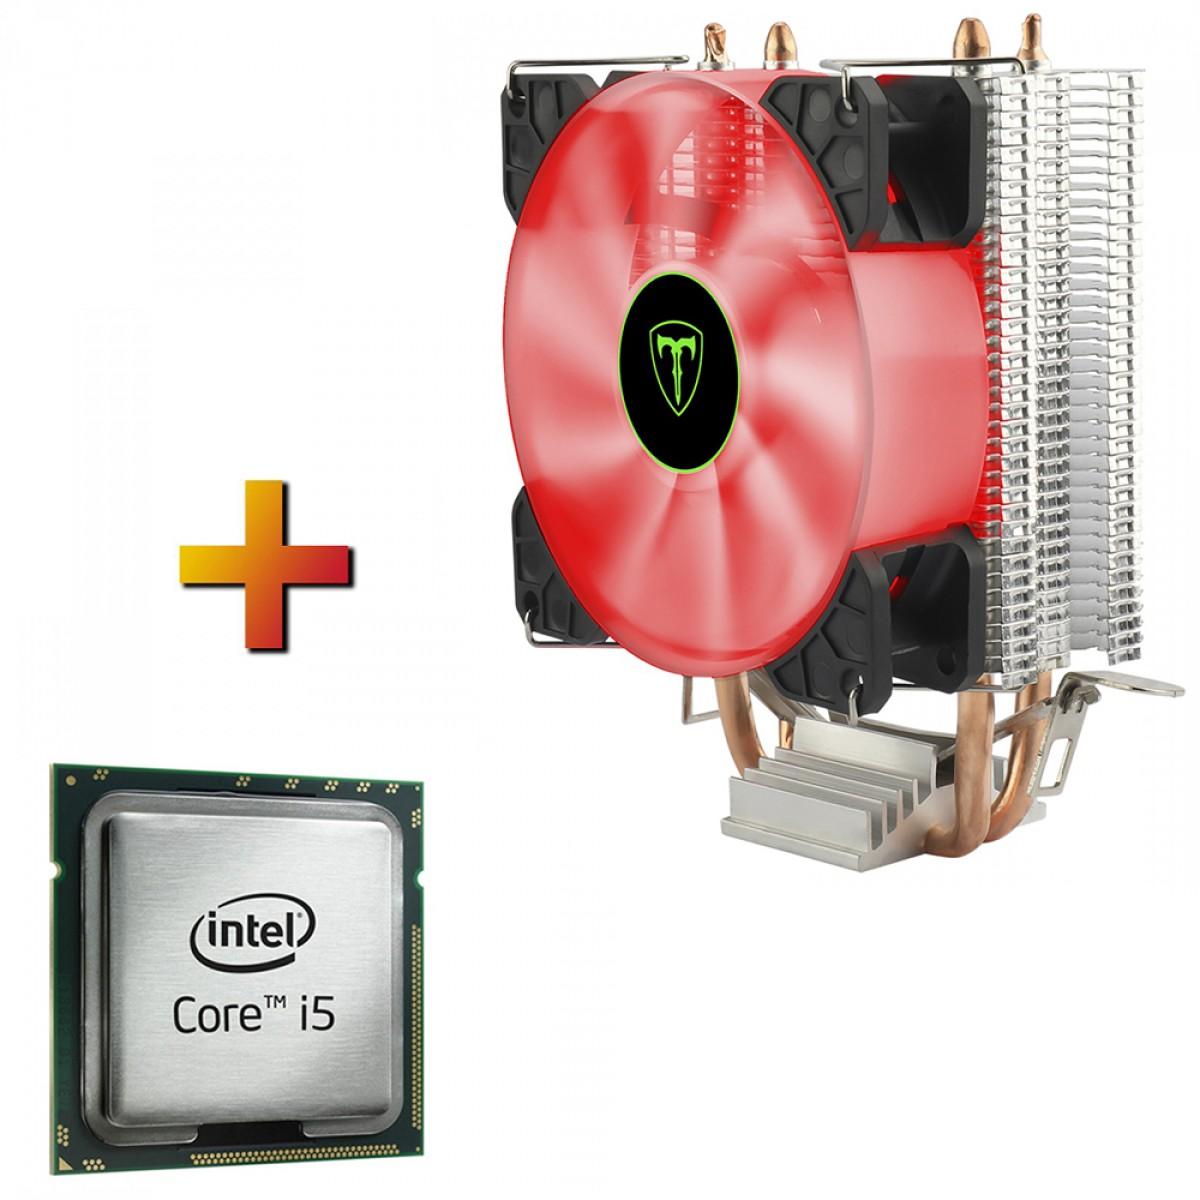 Processador Intel core i5 10400F 2.90GHz (4.30GHz Turbo) + Cooler T-dagger Idun R